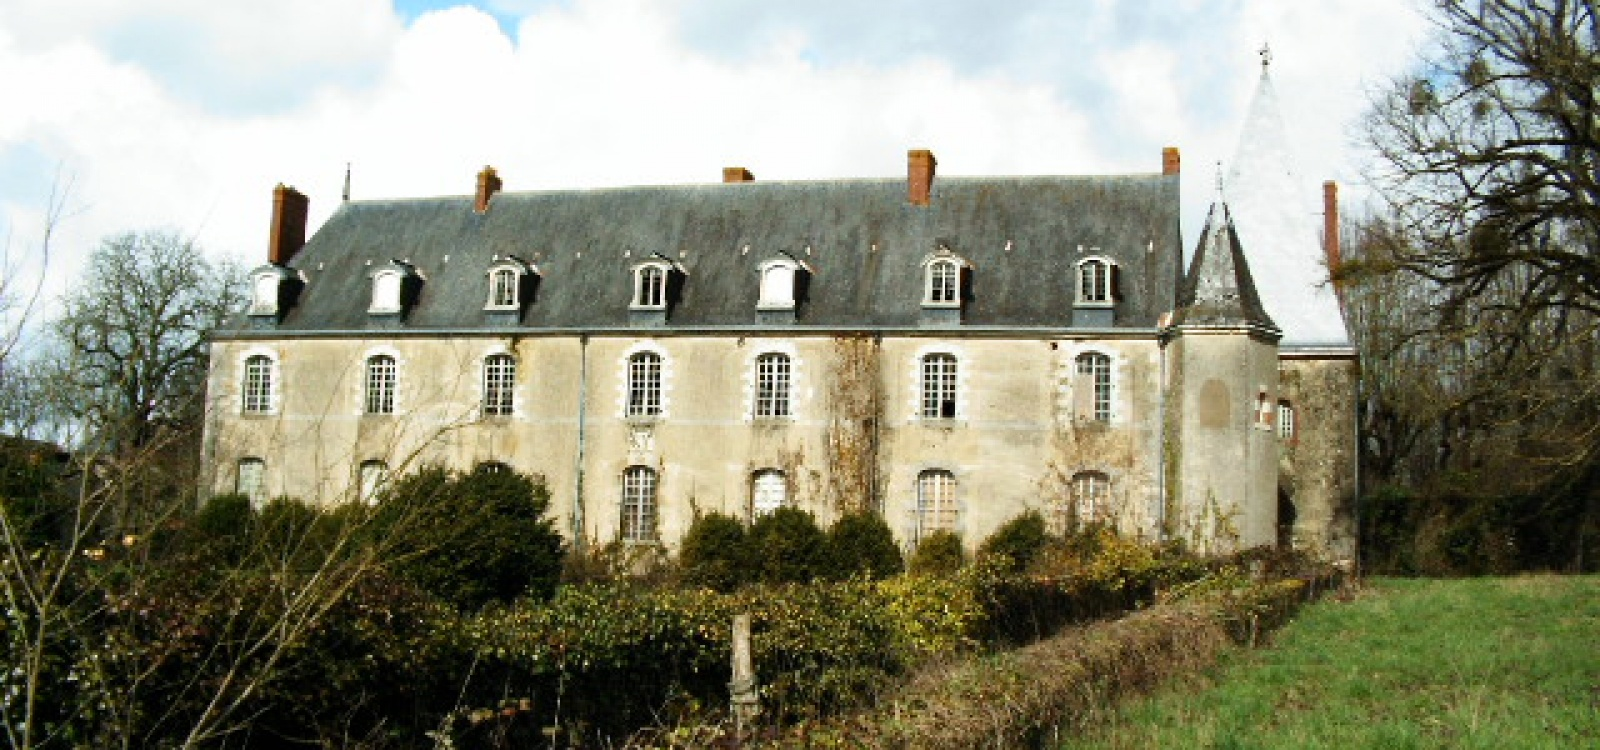 Mayenne,France,Château,1068